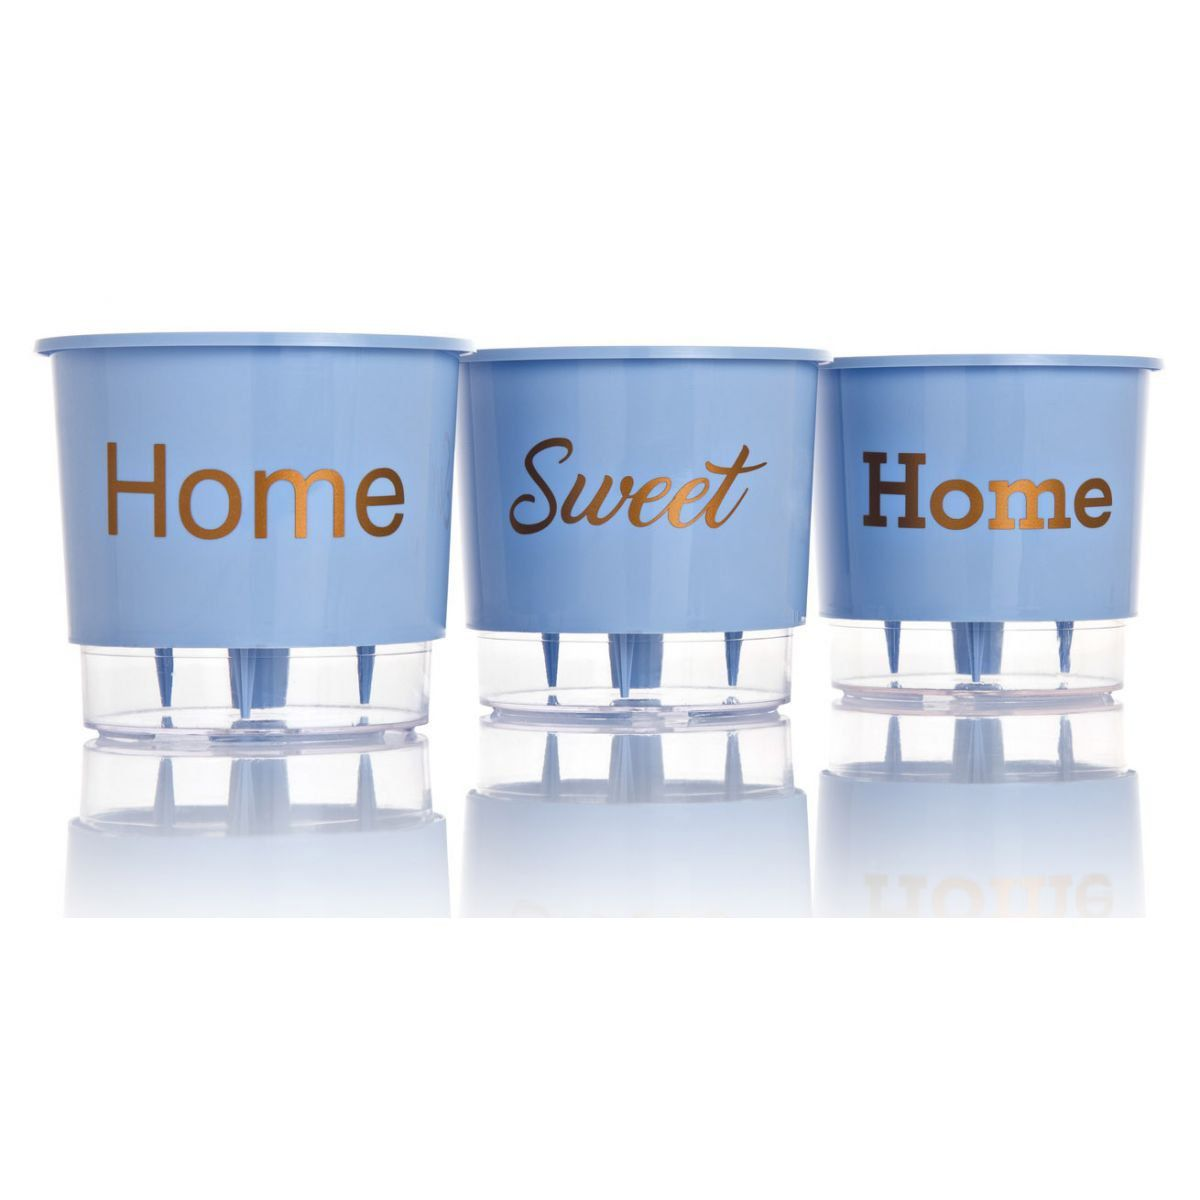 Kit 3 Vasos Autoirrigáveis Pequenos N02 12 cm x 11 cm Home Sweet Home Azul Serenity